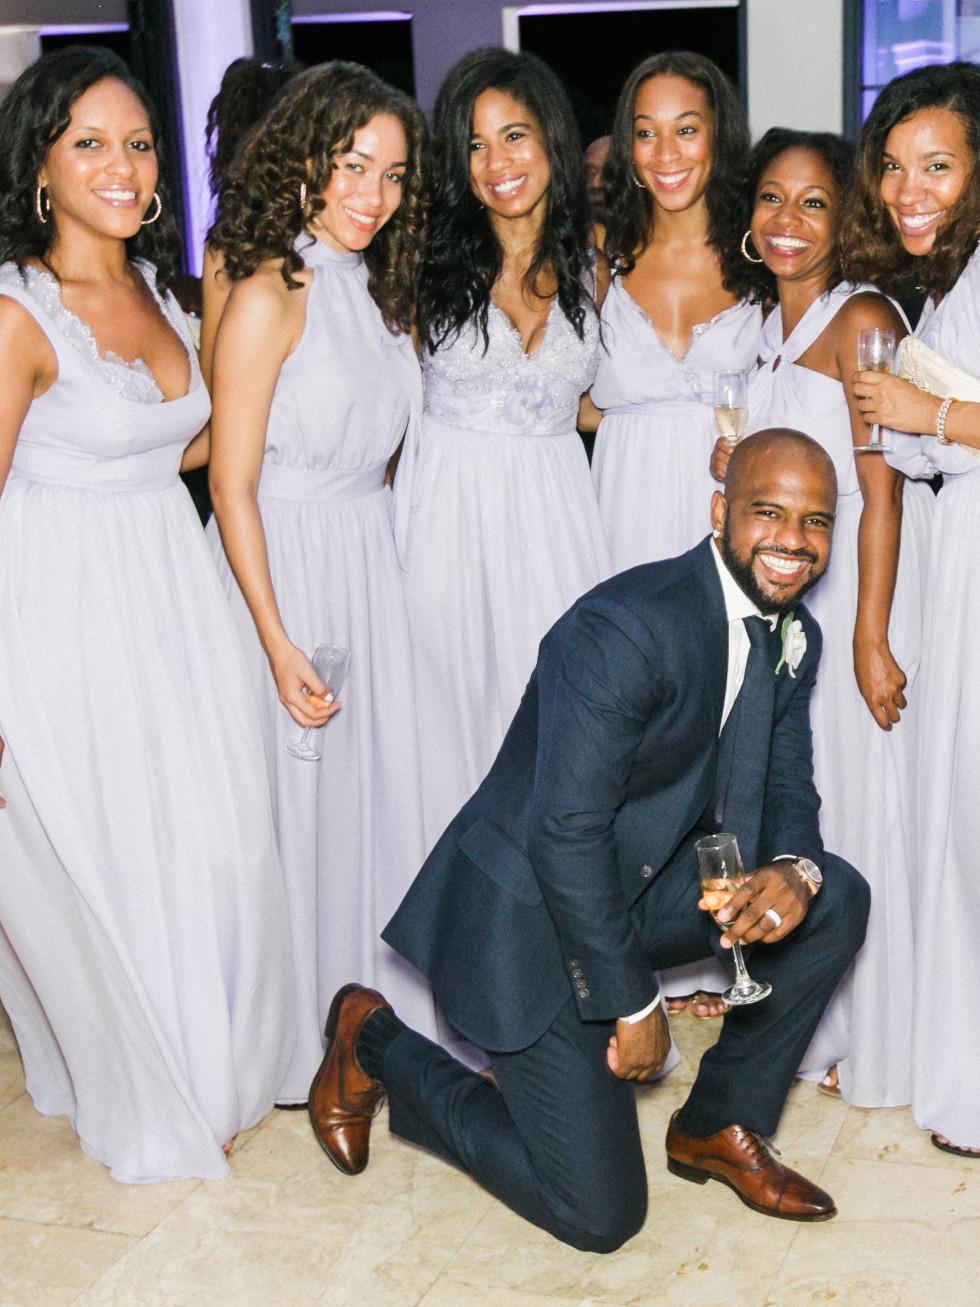 Wonderful Weddings, Kendhal Gardner, Feb. 2016, Rachel Gardner, Ana Flenoy, Brittany Ennix, Christina Jacke, Alysha English, Lauren Poindexter